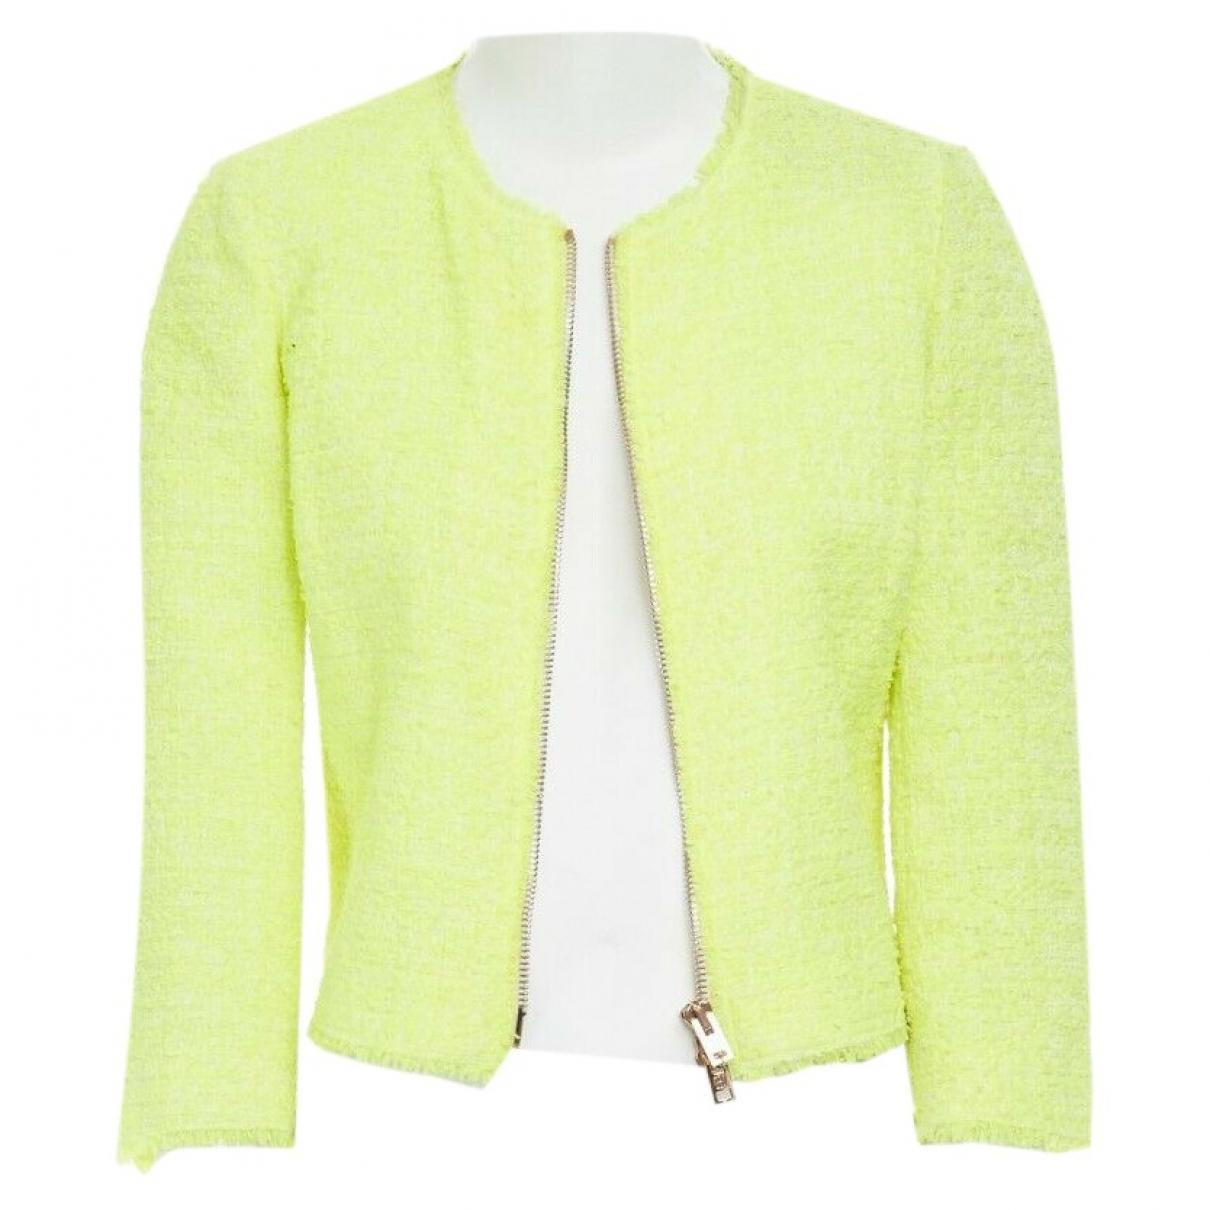 Giambattista Valli \N Yellow Cotton jacket for Women XS International